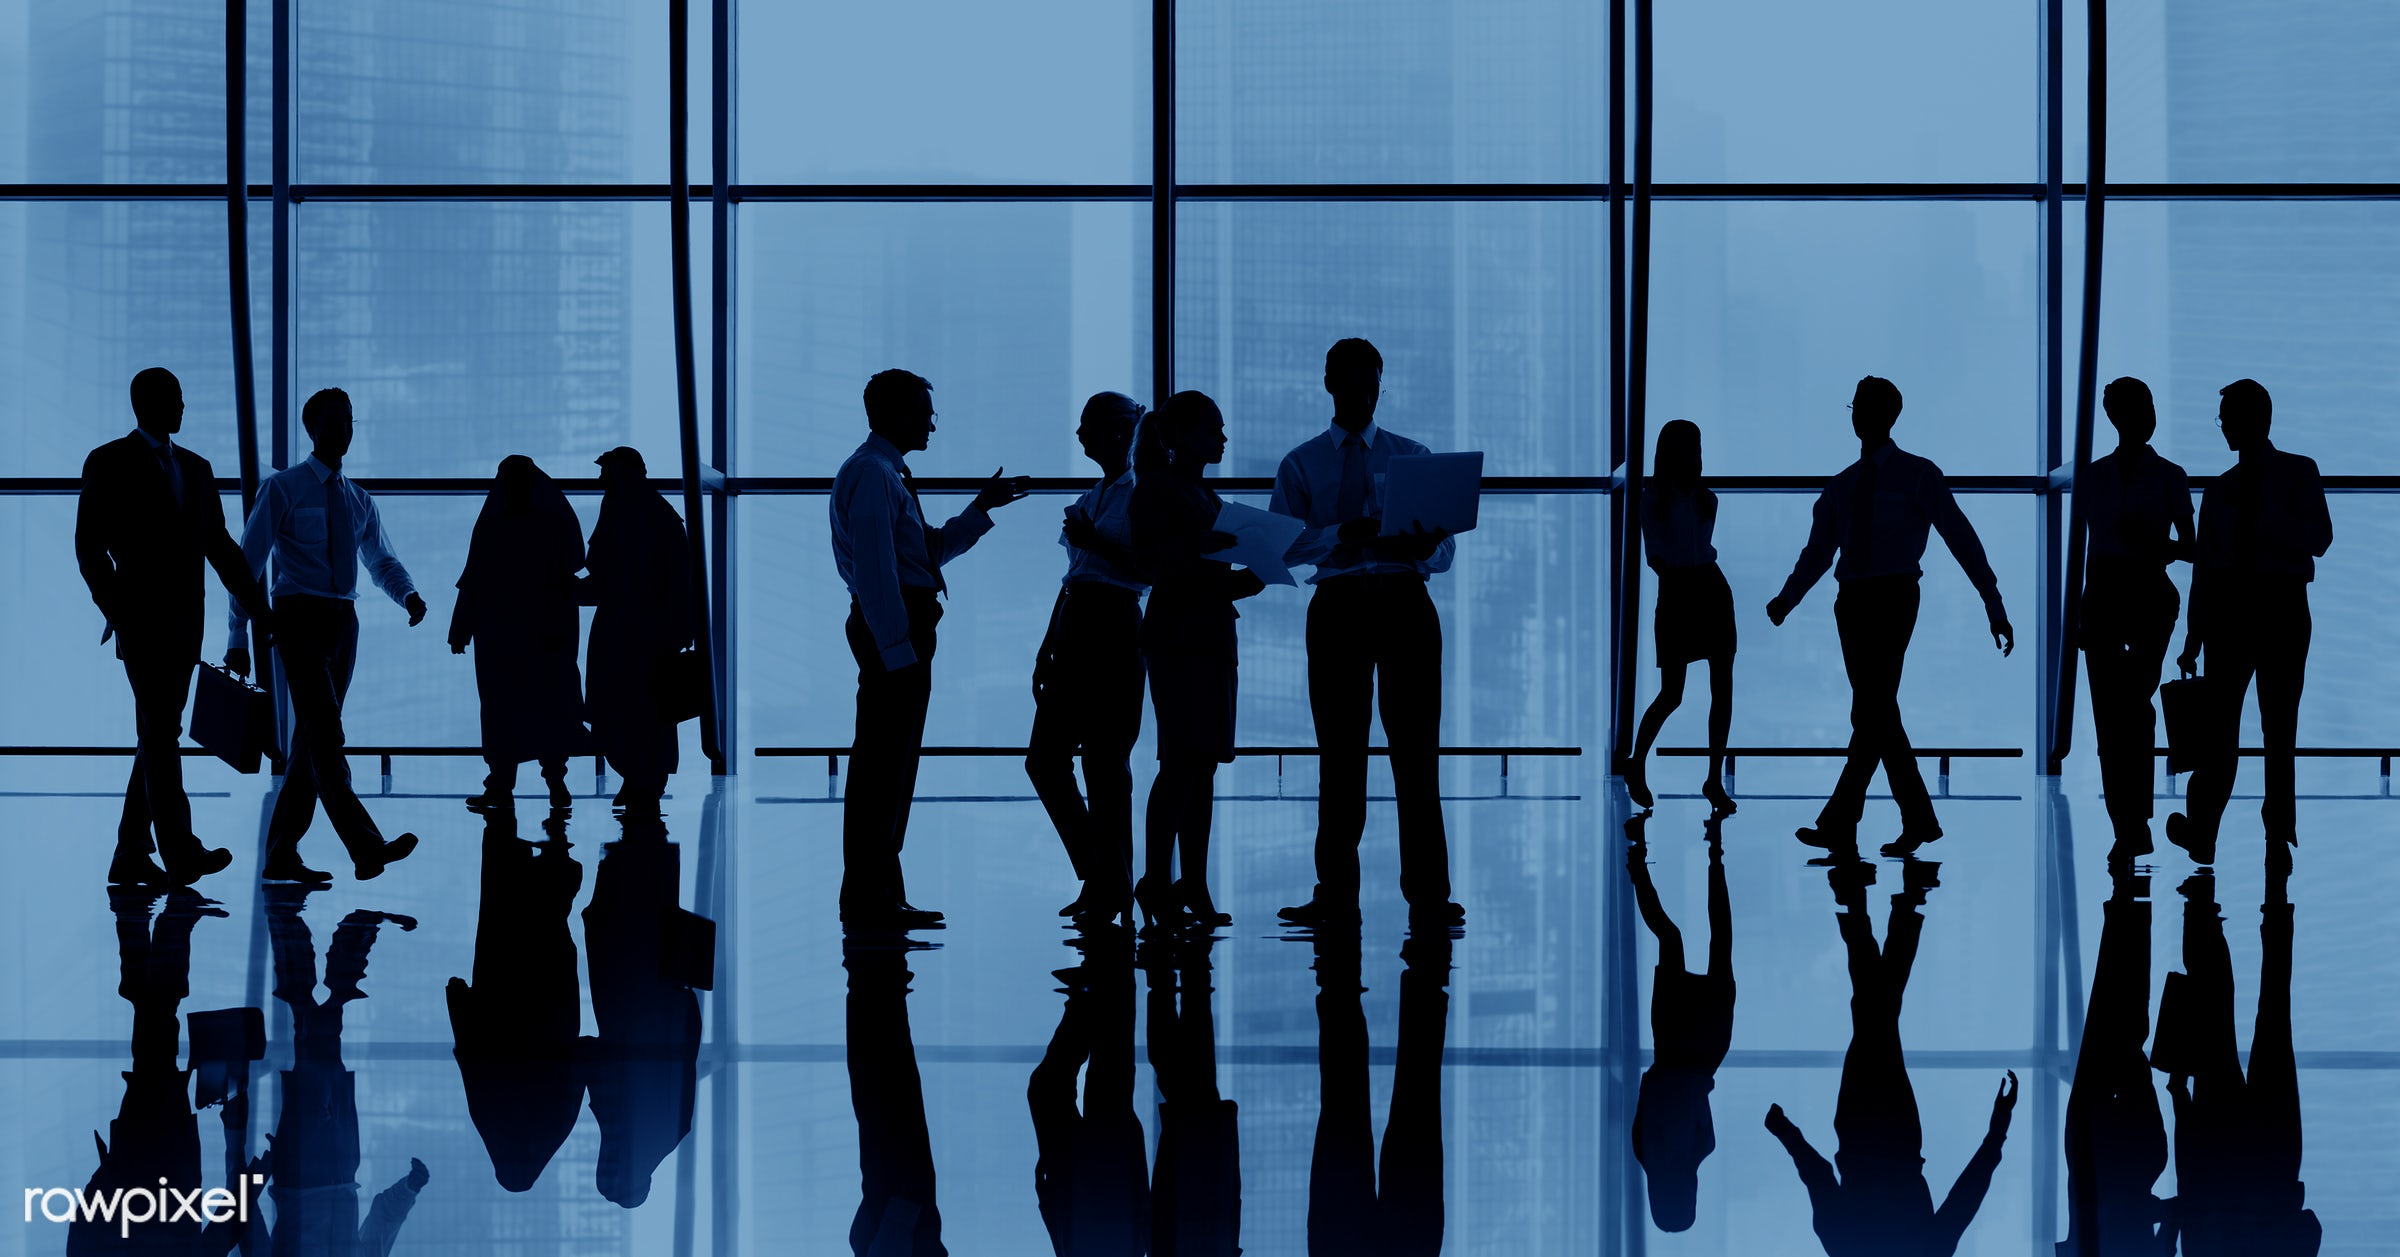 adult, blue, brainstorming, building, business, business people, businessmen, businesswomen, city, city life, cityscape,...